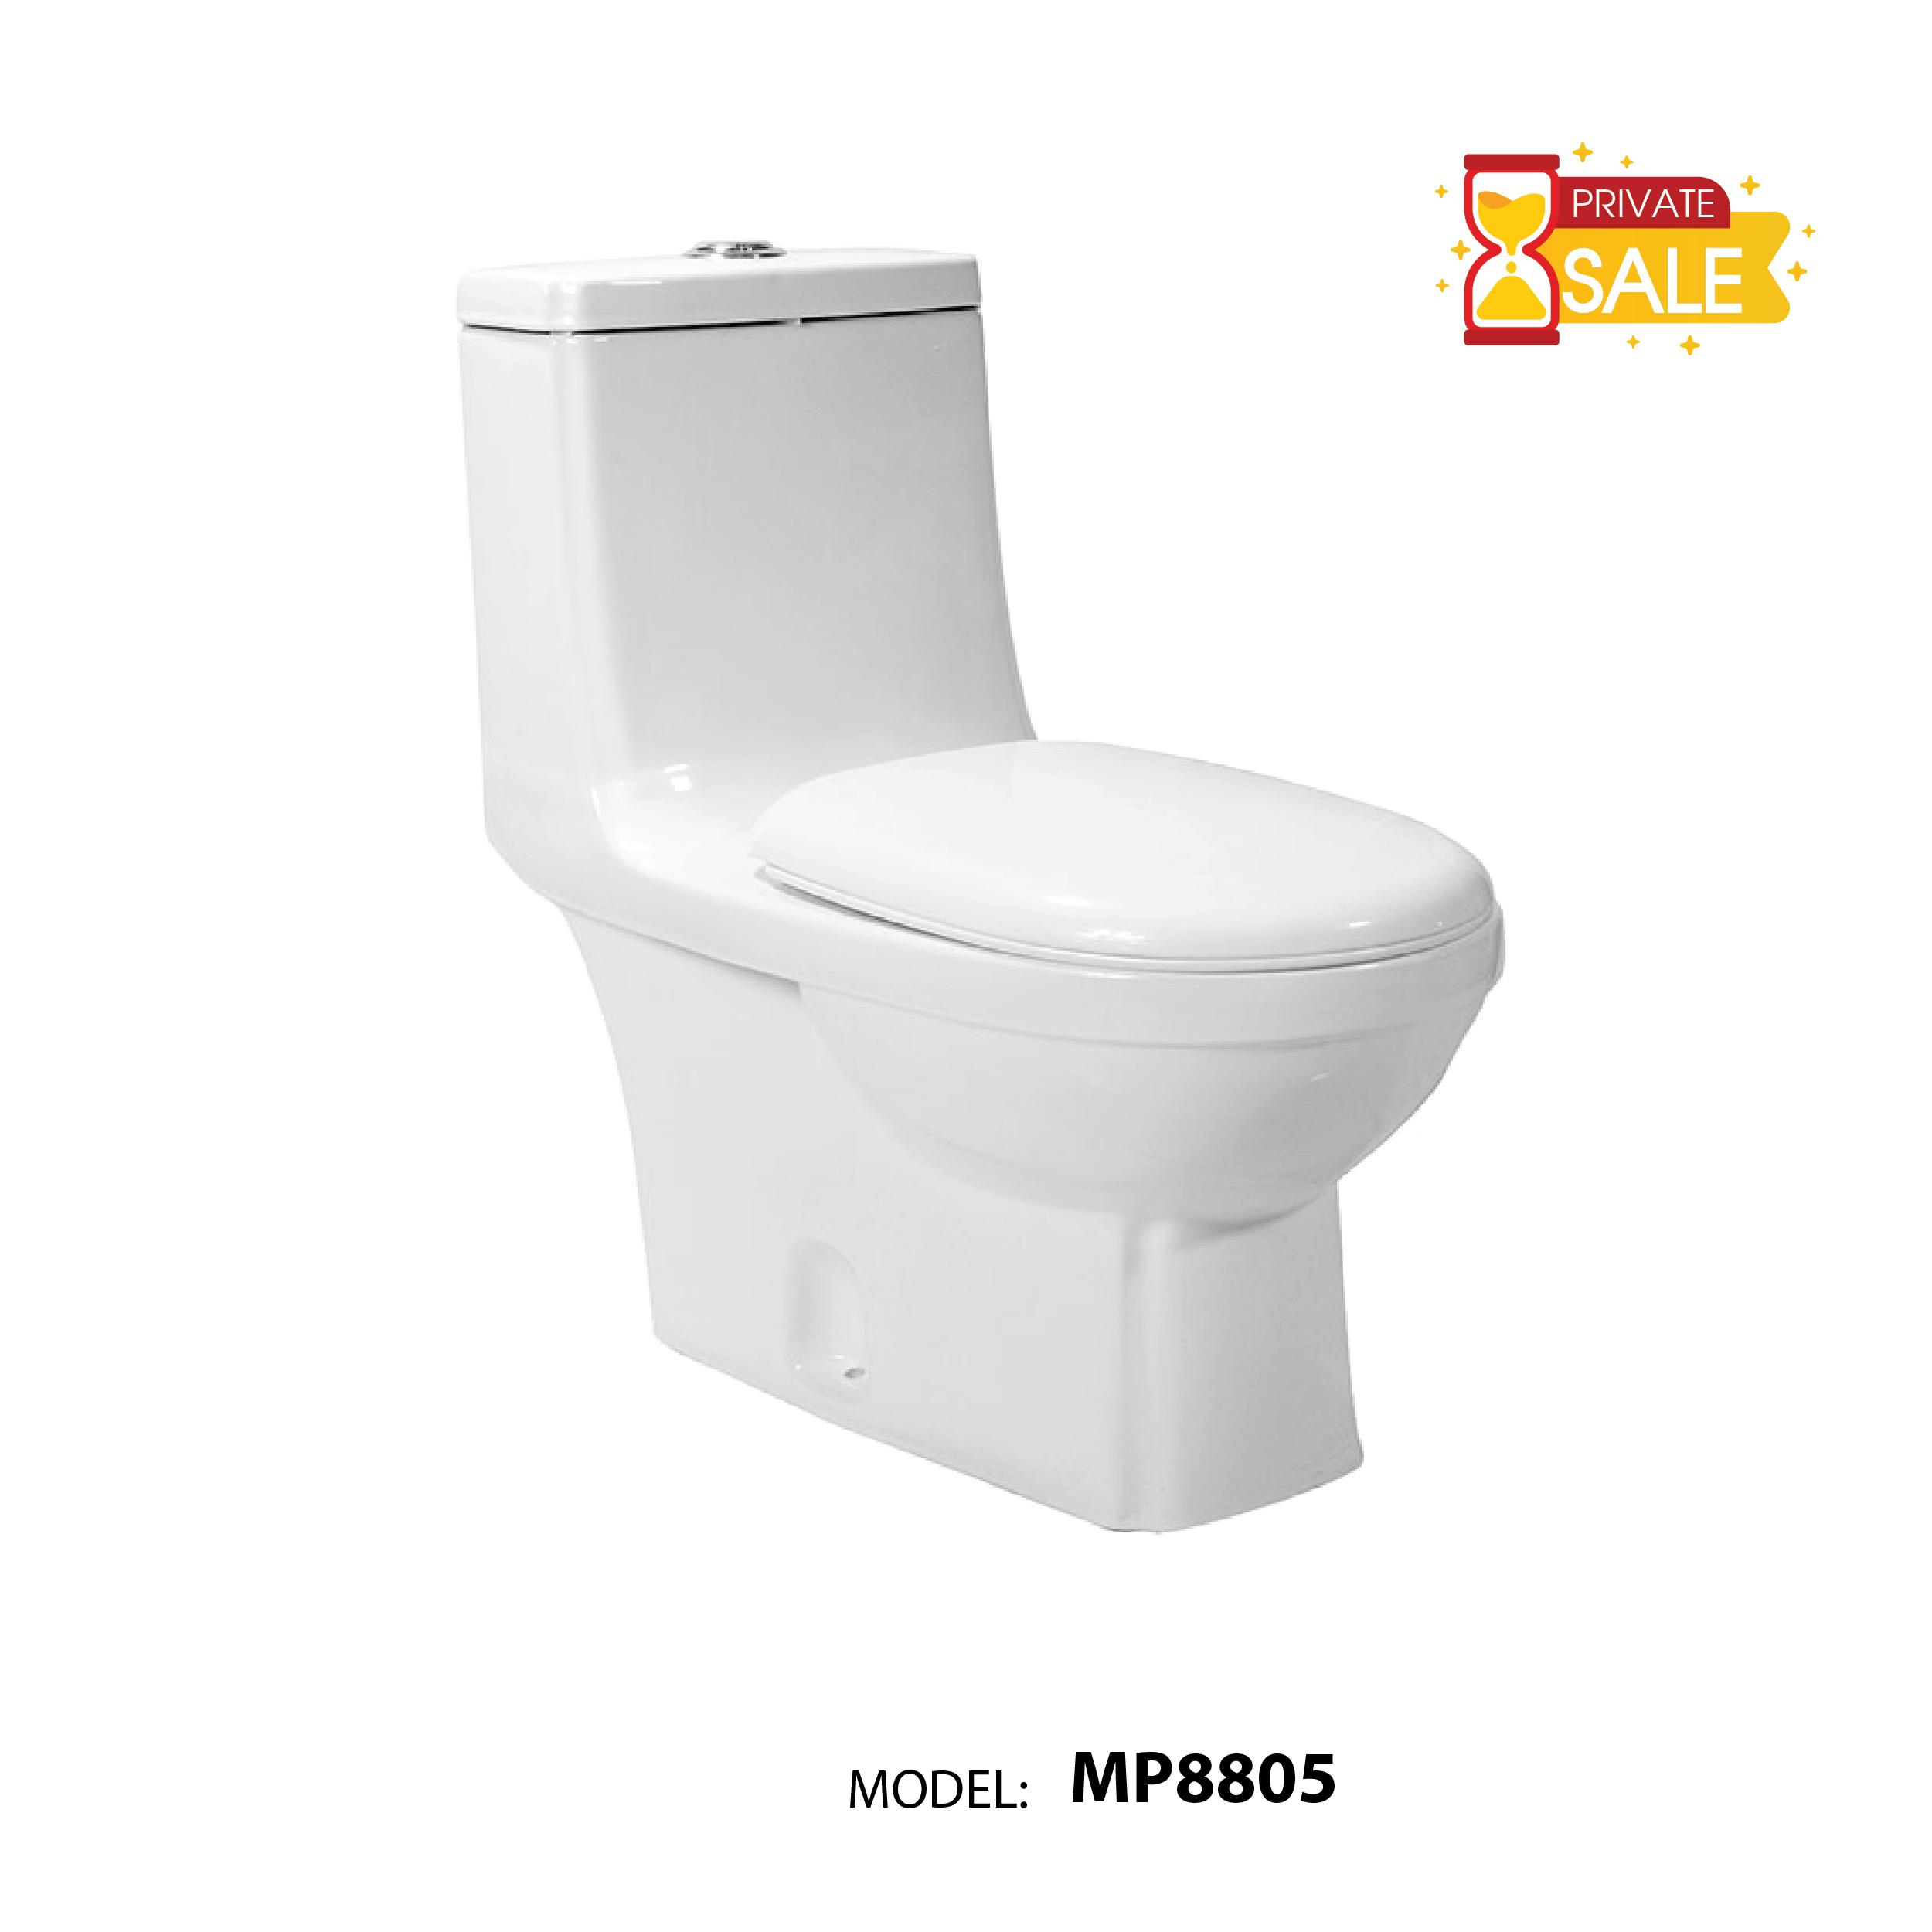 BỒN CẦU CARANO 1 KHỐI MP8805 ( Toilet model: MP8805 )